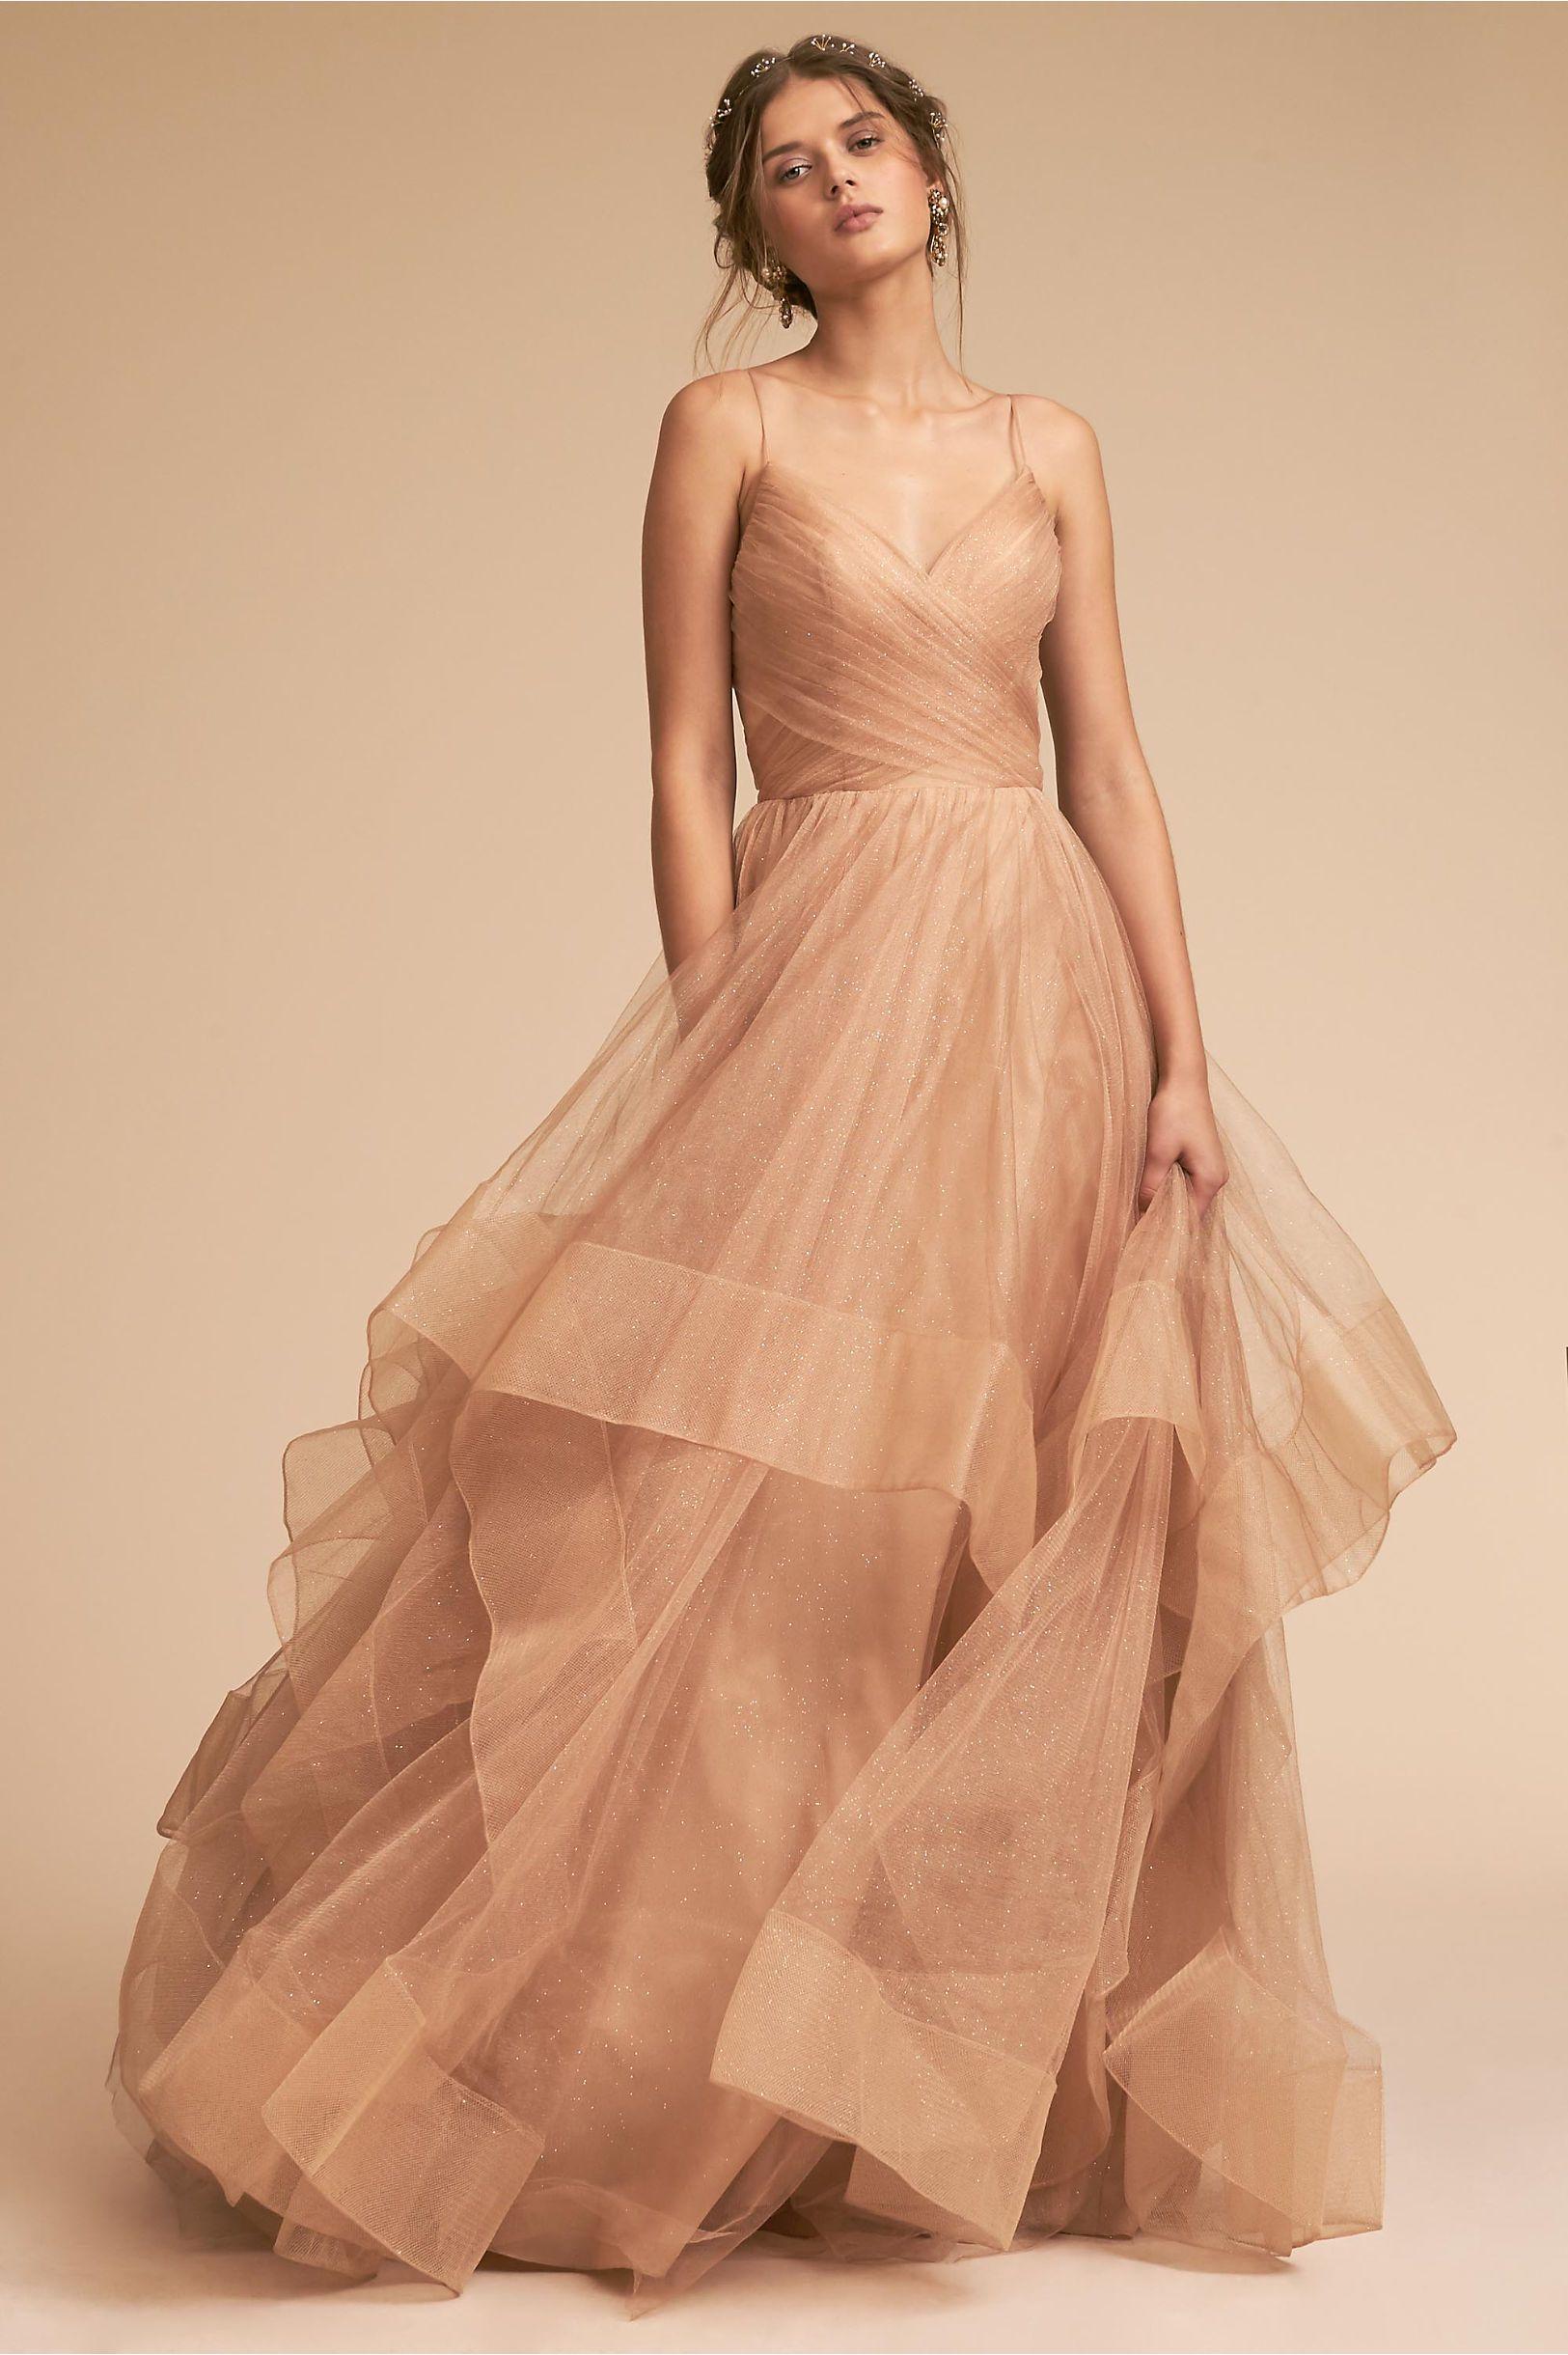 e94c2761ae51 BHLDN s Chantelle Dress in Gold